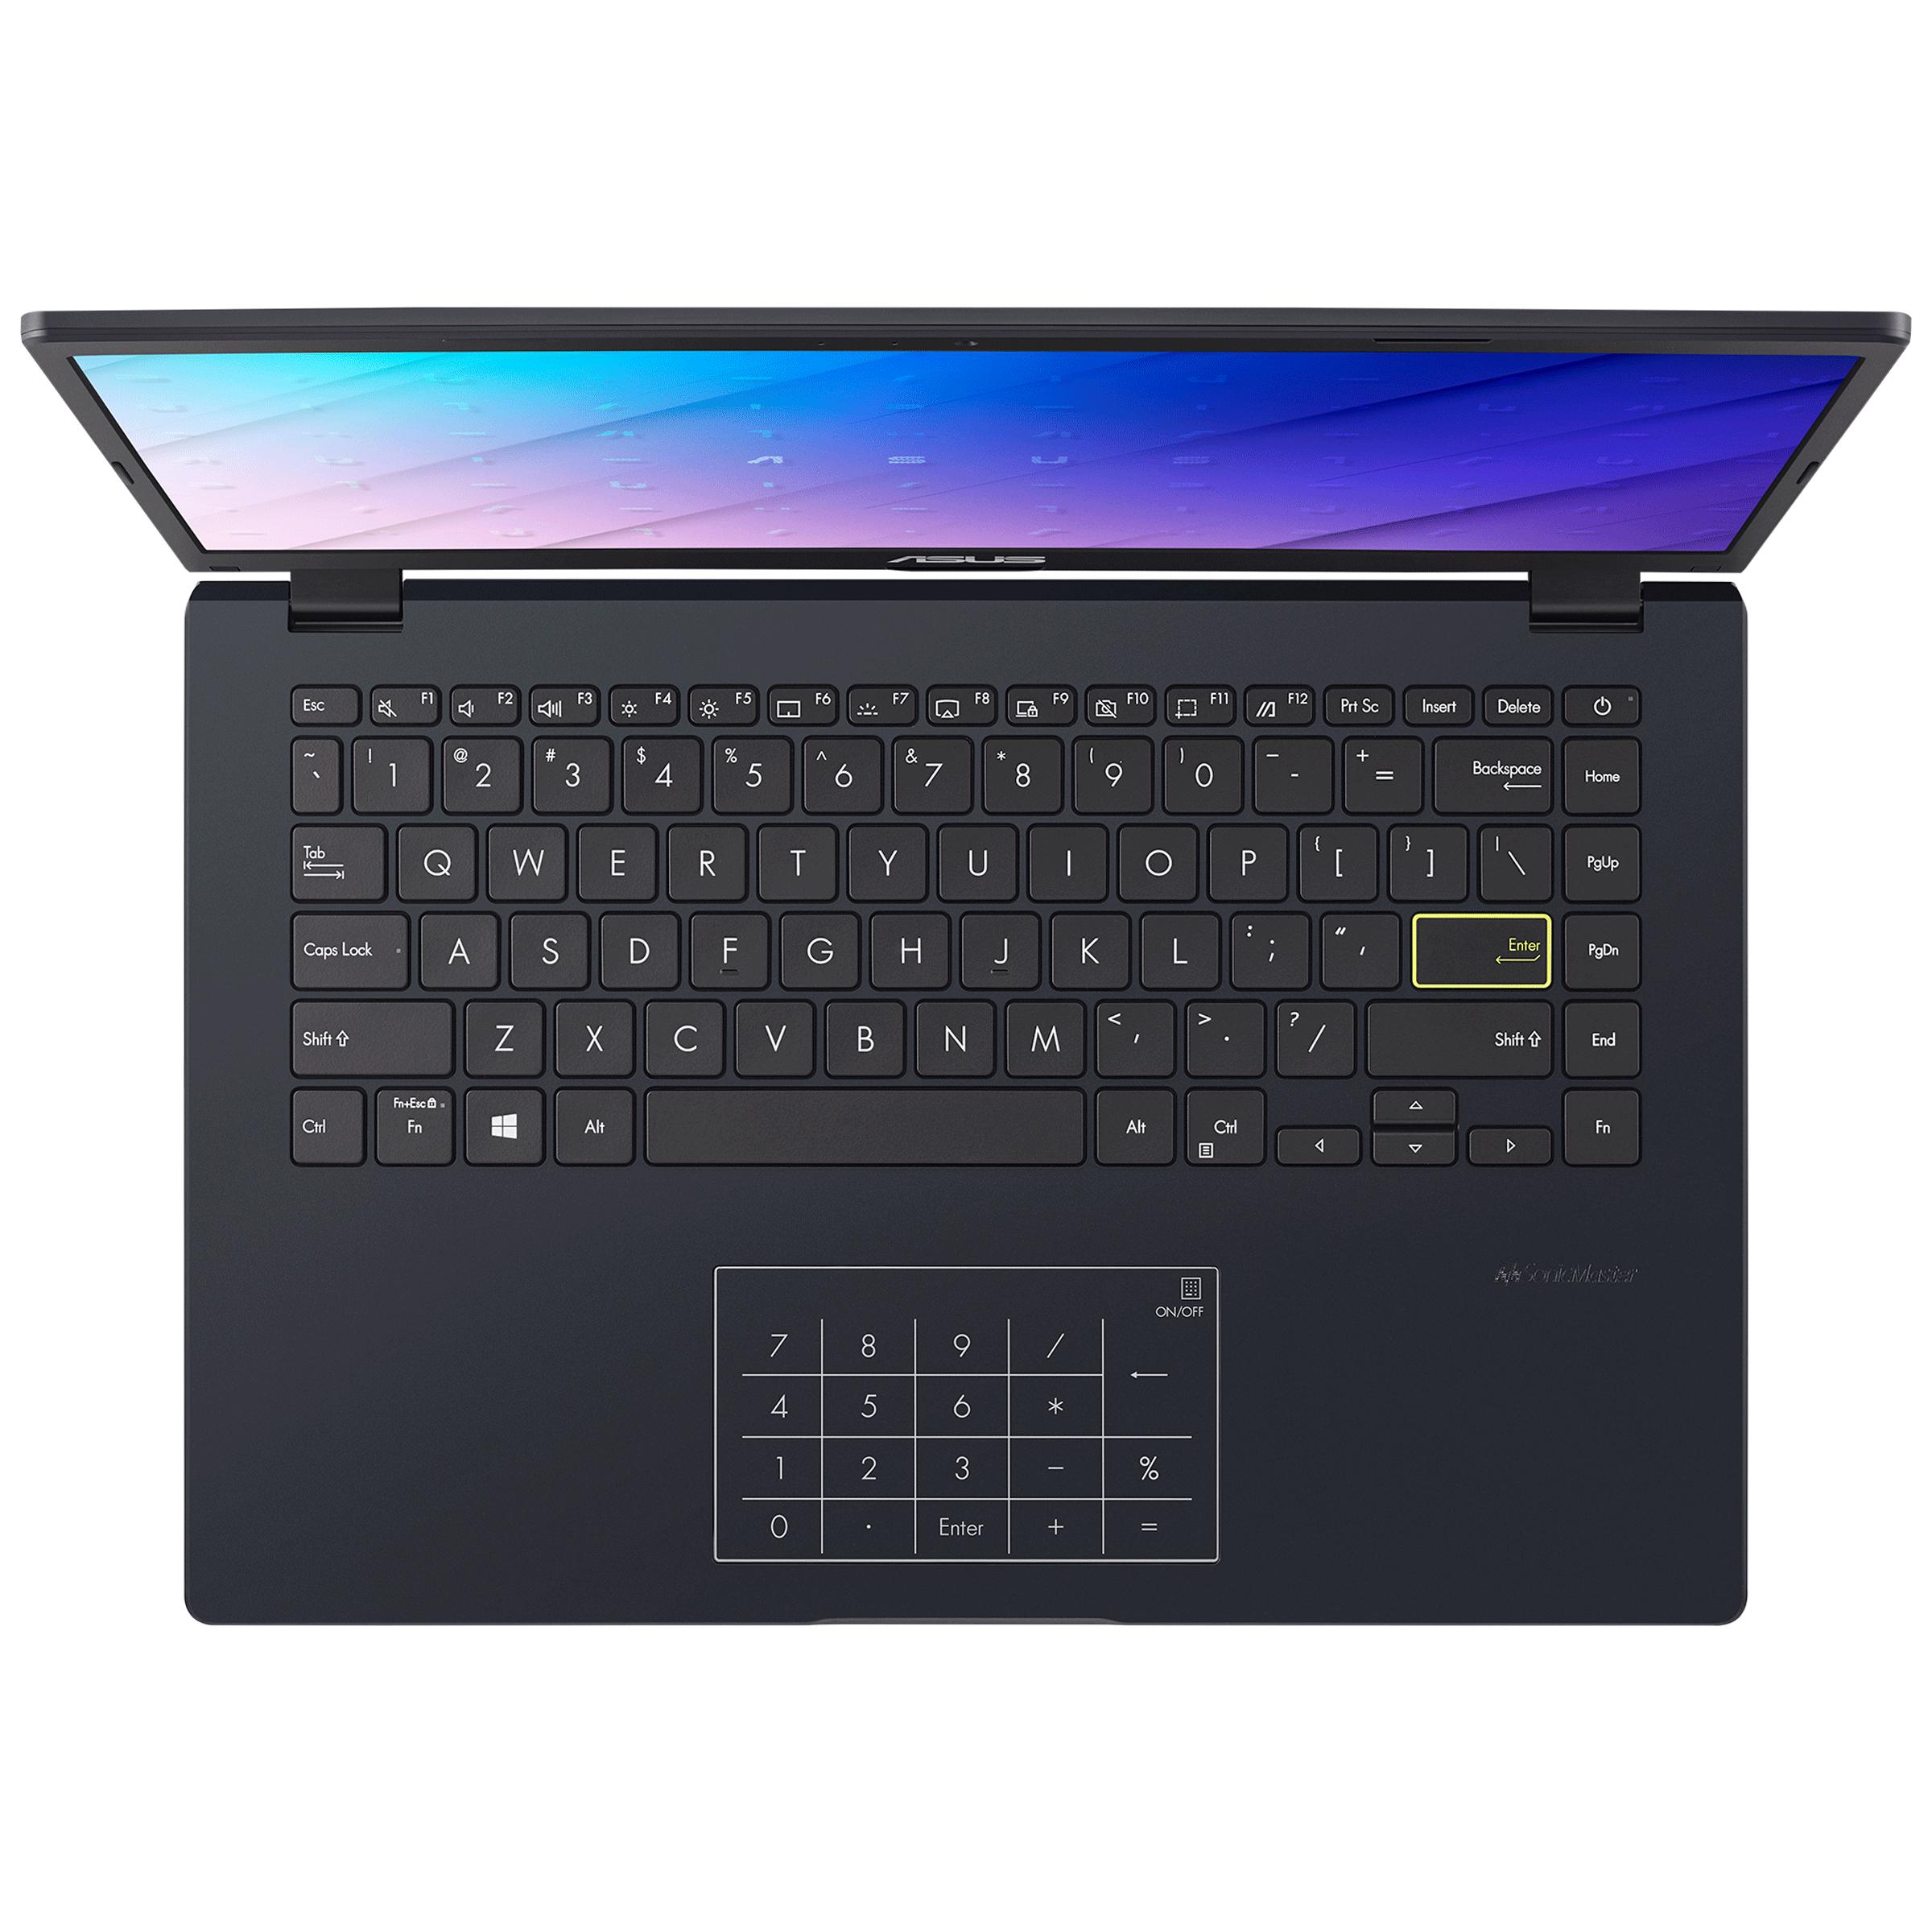 Asus E410MA-EB001T (90NB0Q11-M22940) Celeron Windows 10 Home Laptop (4GB RAM, 256GB SSD, Intel UHD Graphics 600, 35.56cm, Peacock Blue) 4